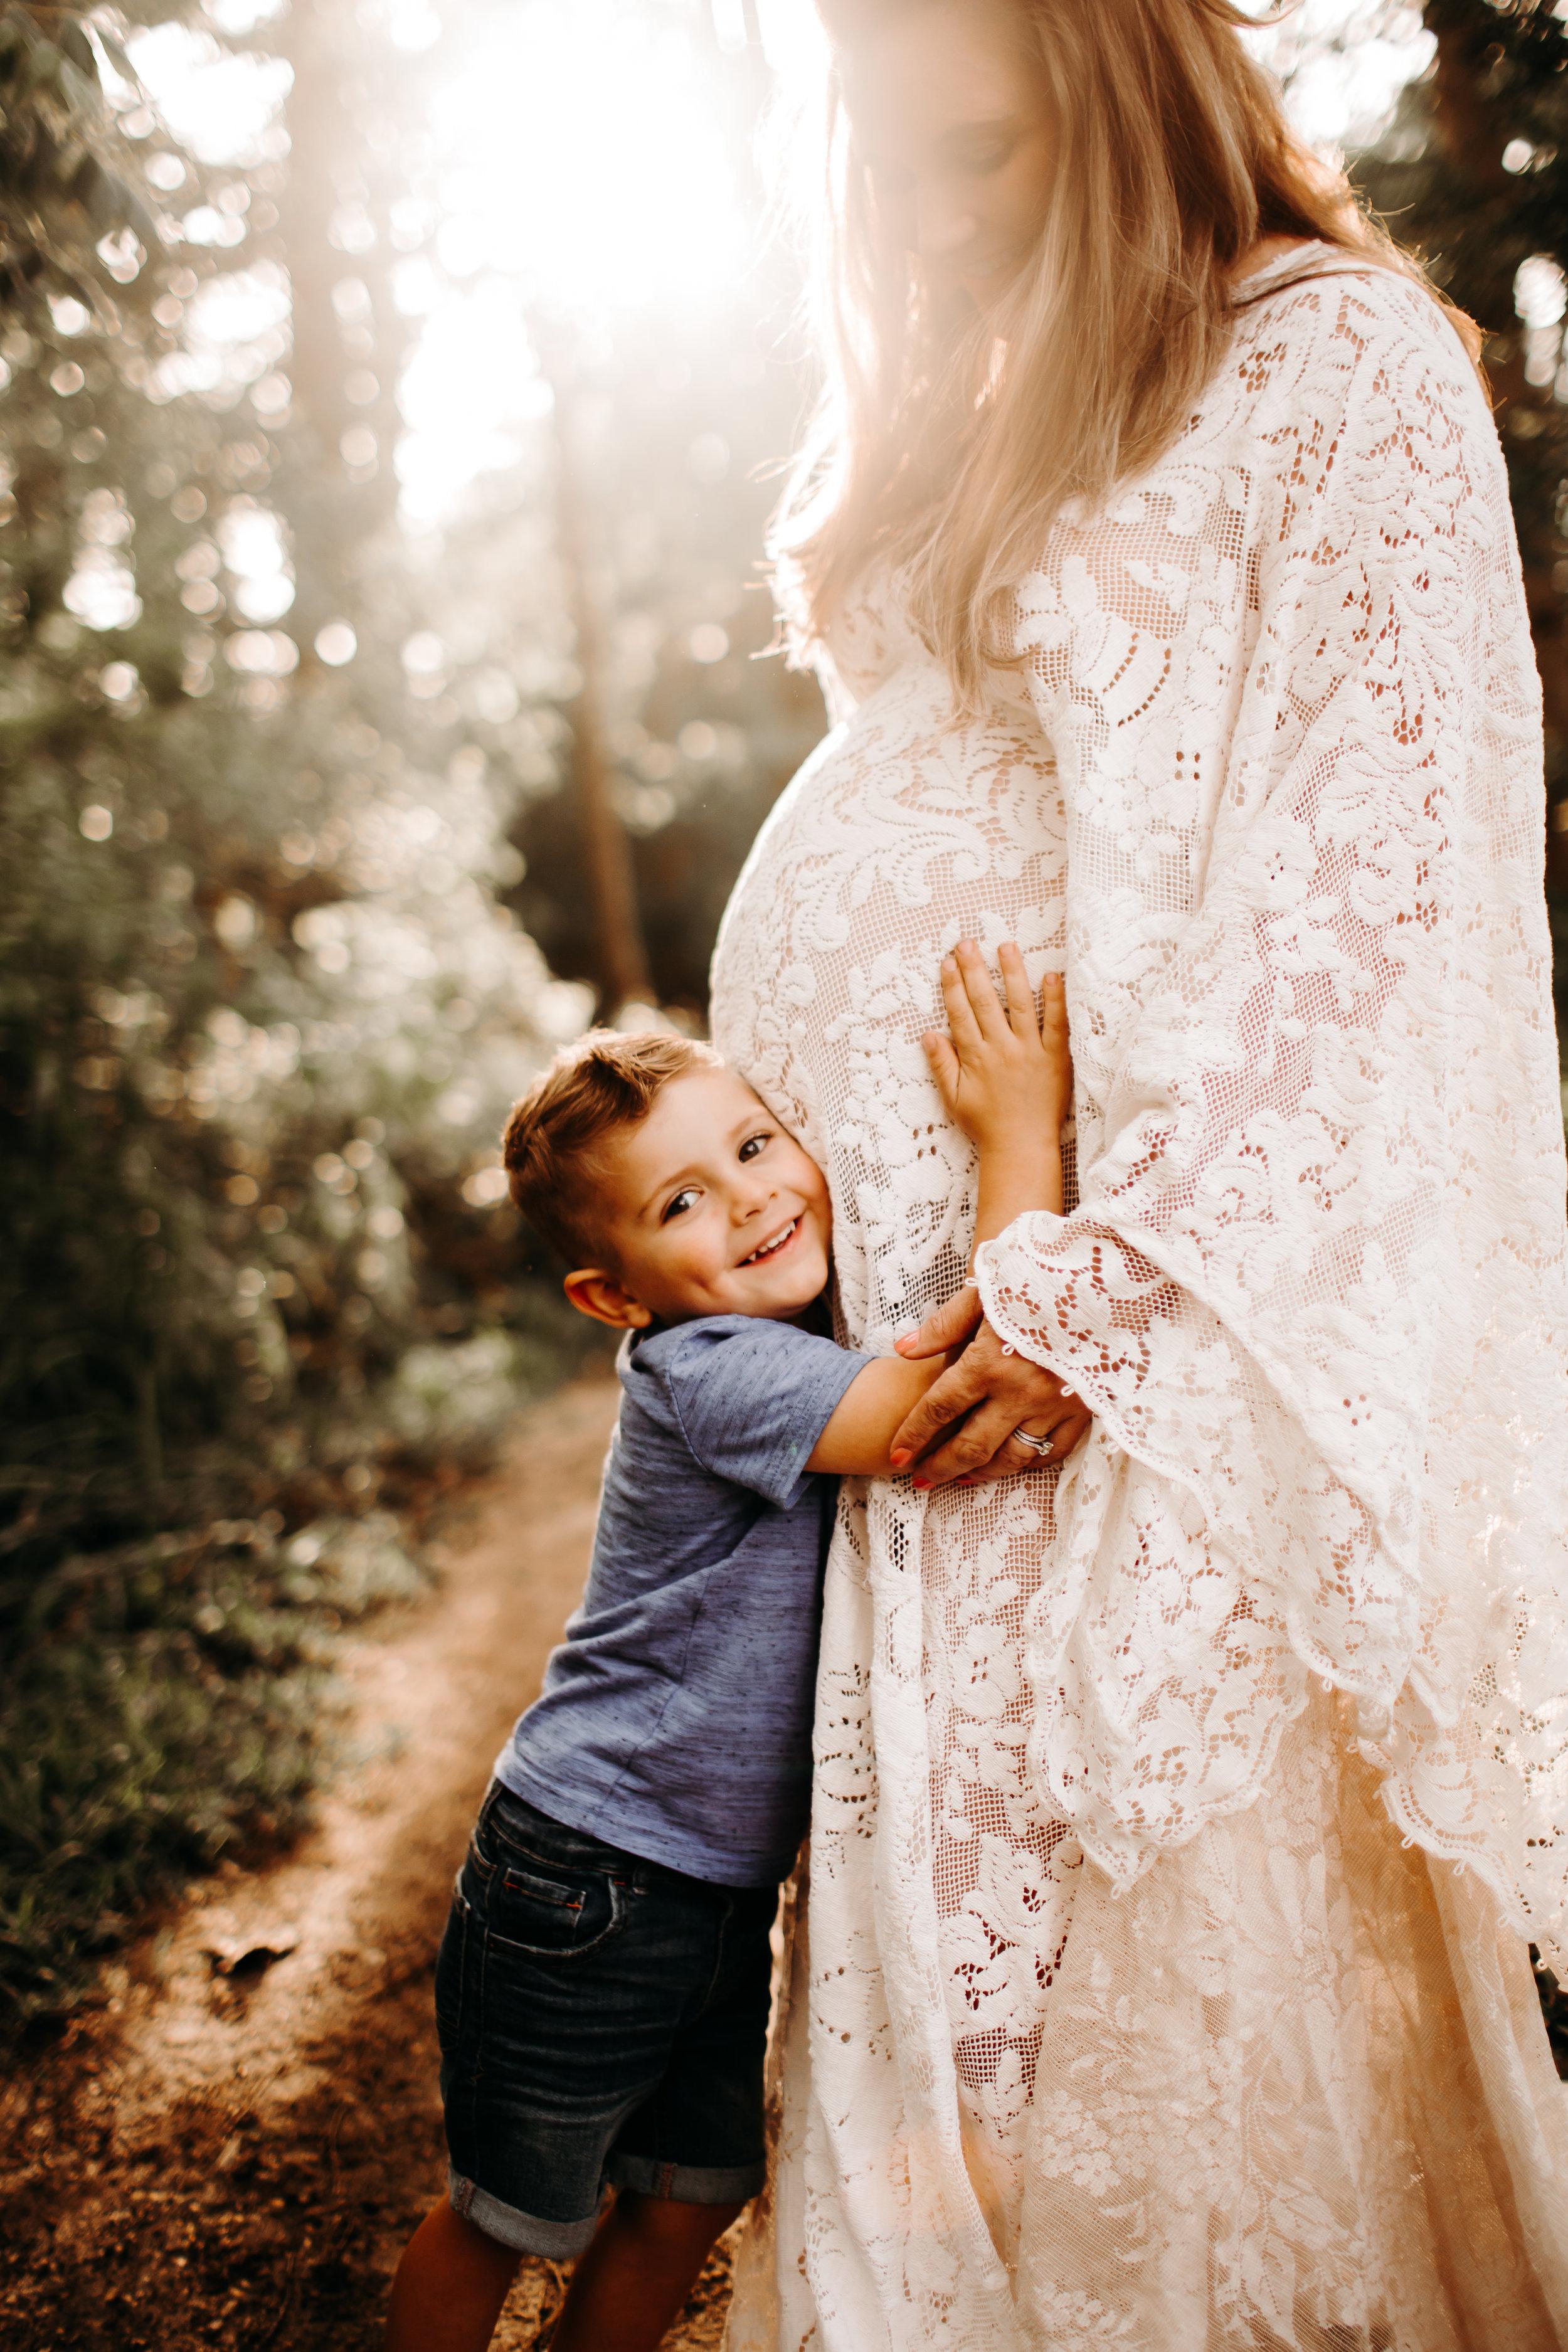 Alex-San-Antonio-Maternity-Photographer-6.jpg